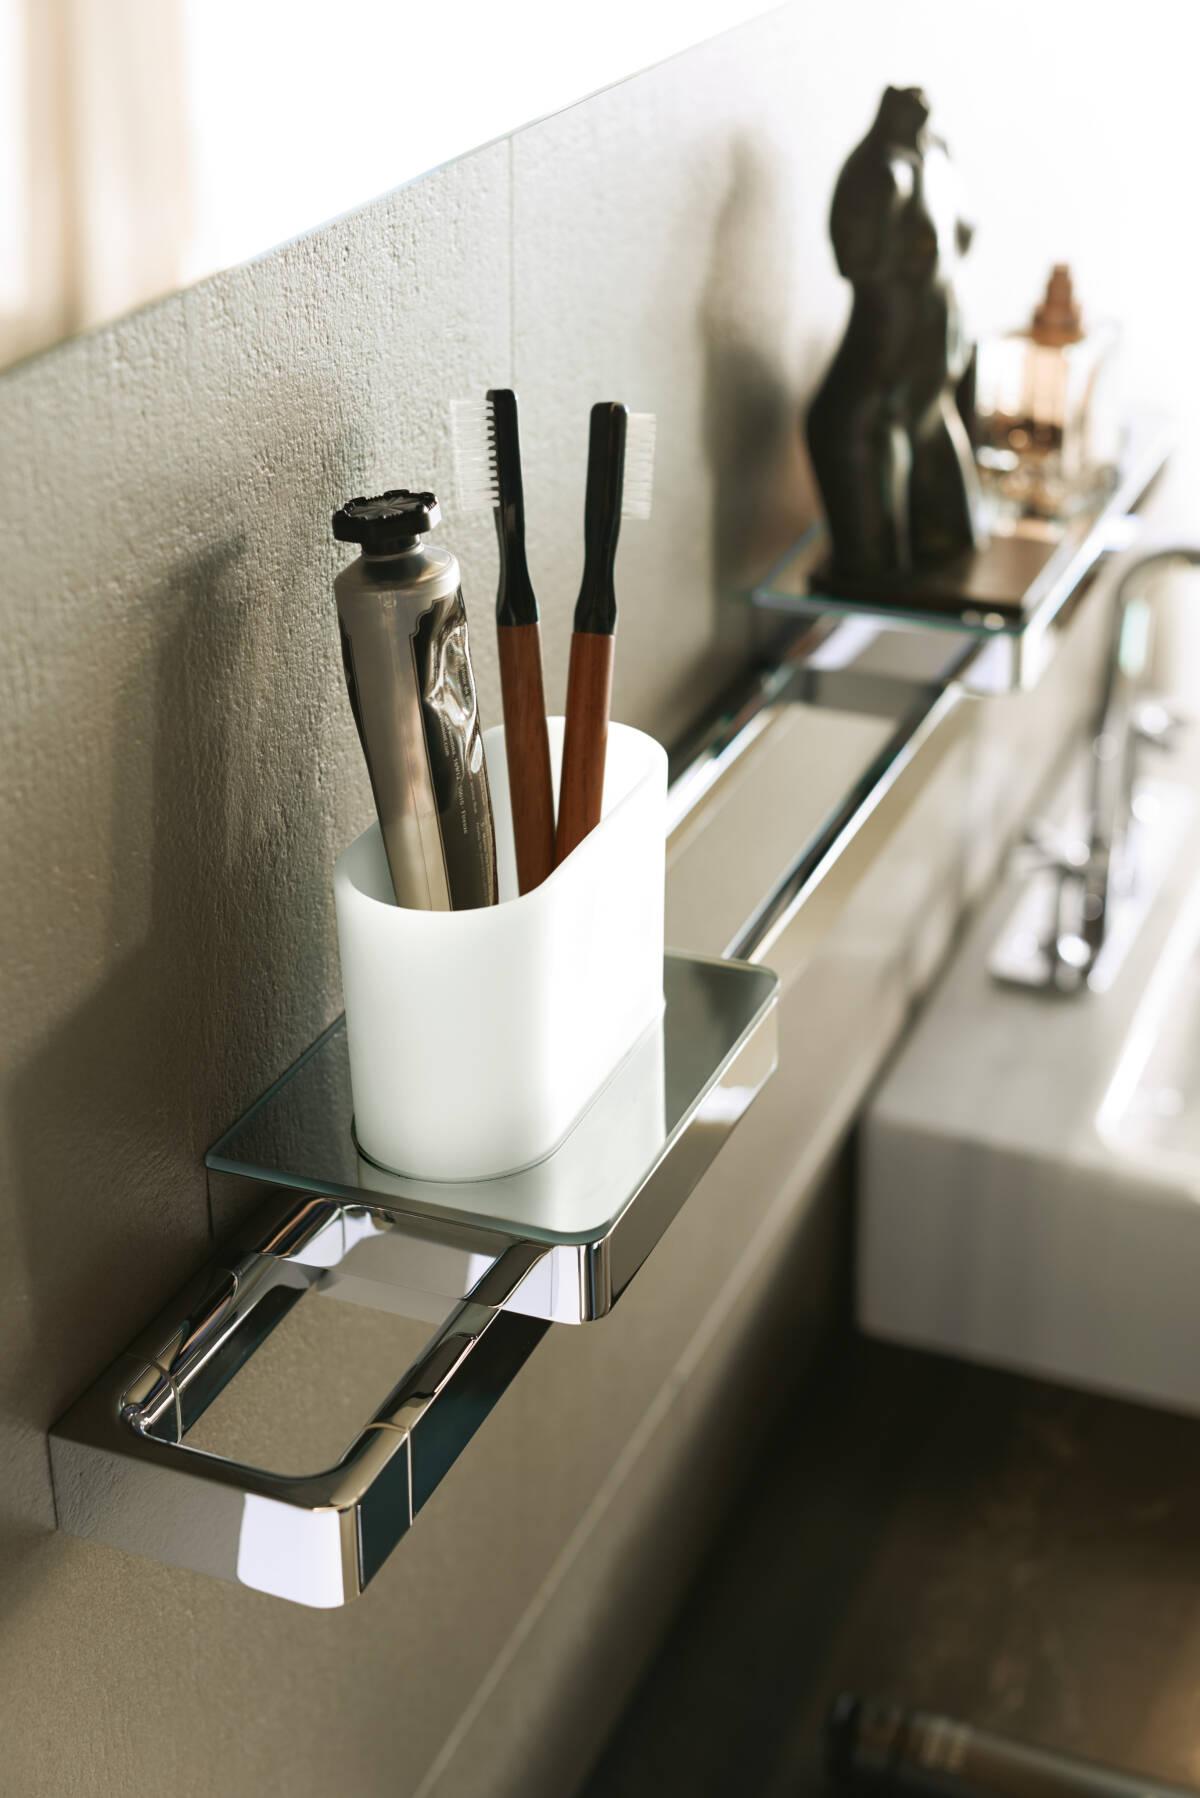 AXOR AXOR Universal Accessories, Rail / Bath towel holder 600 mm ...